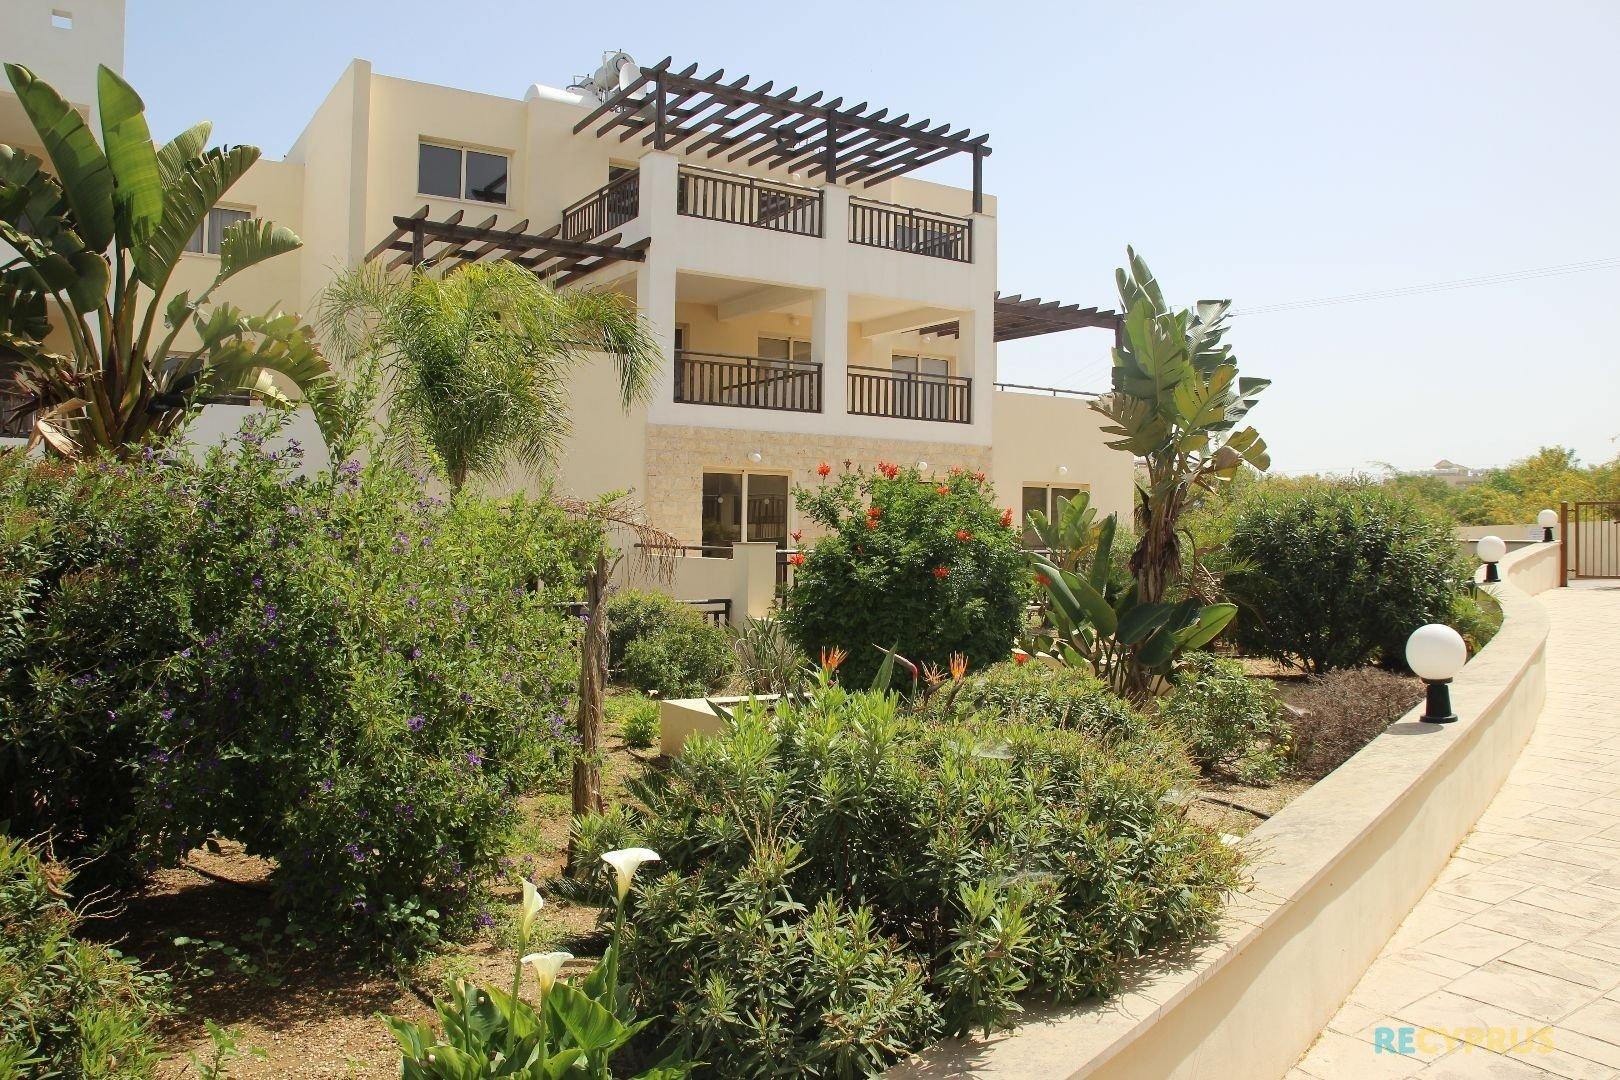 Apartment for sale Kapparis Famagusta Cyprus 10 3560